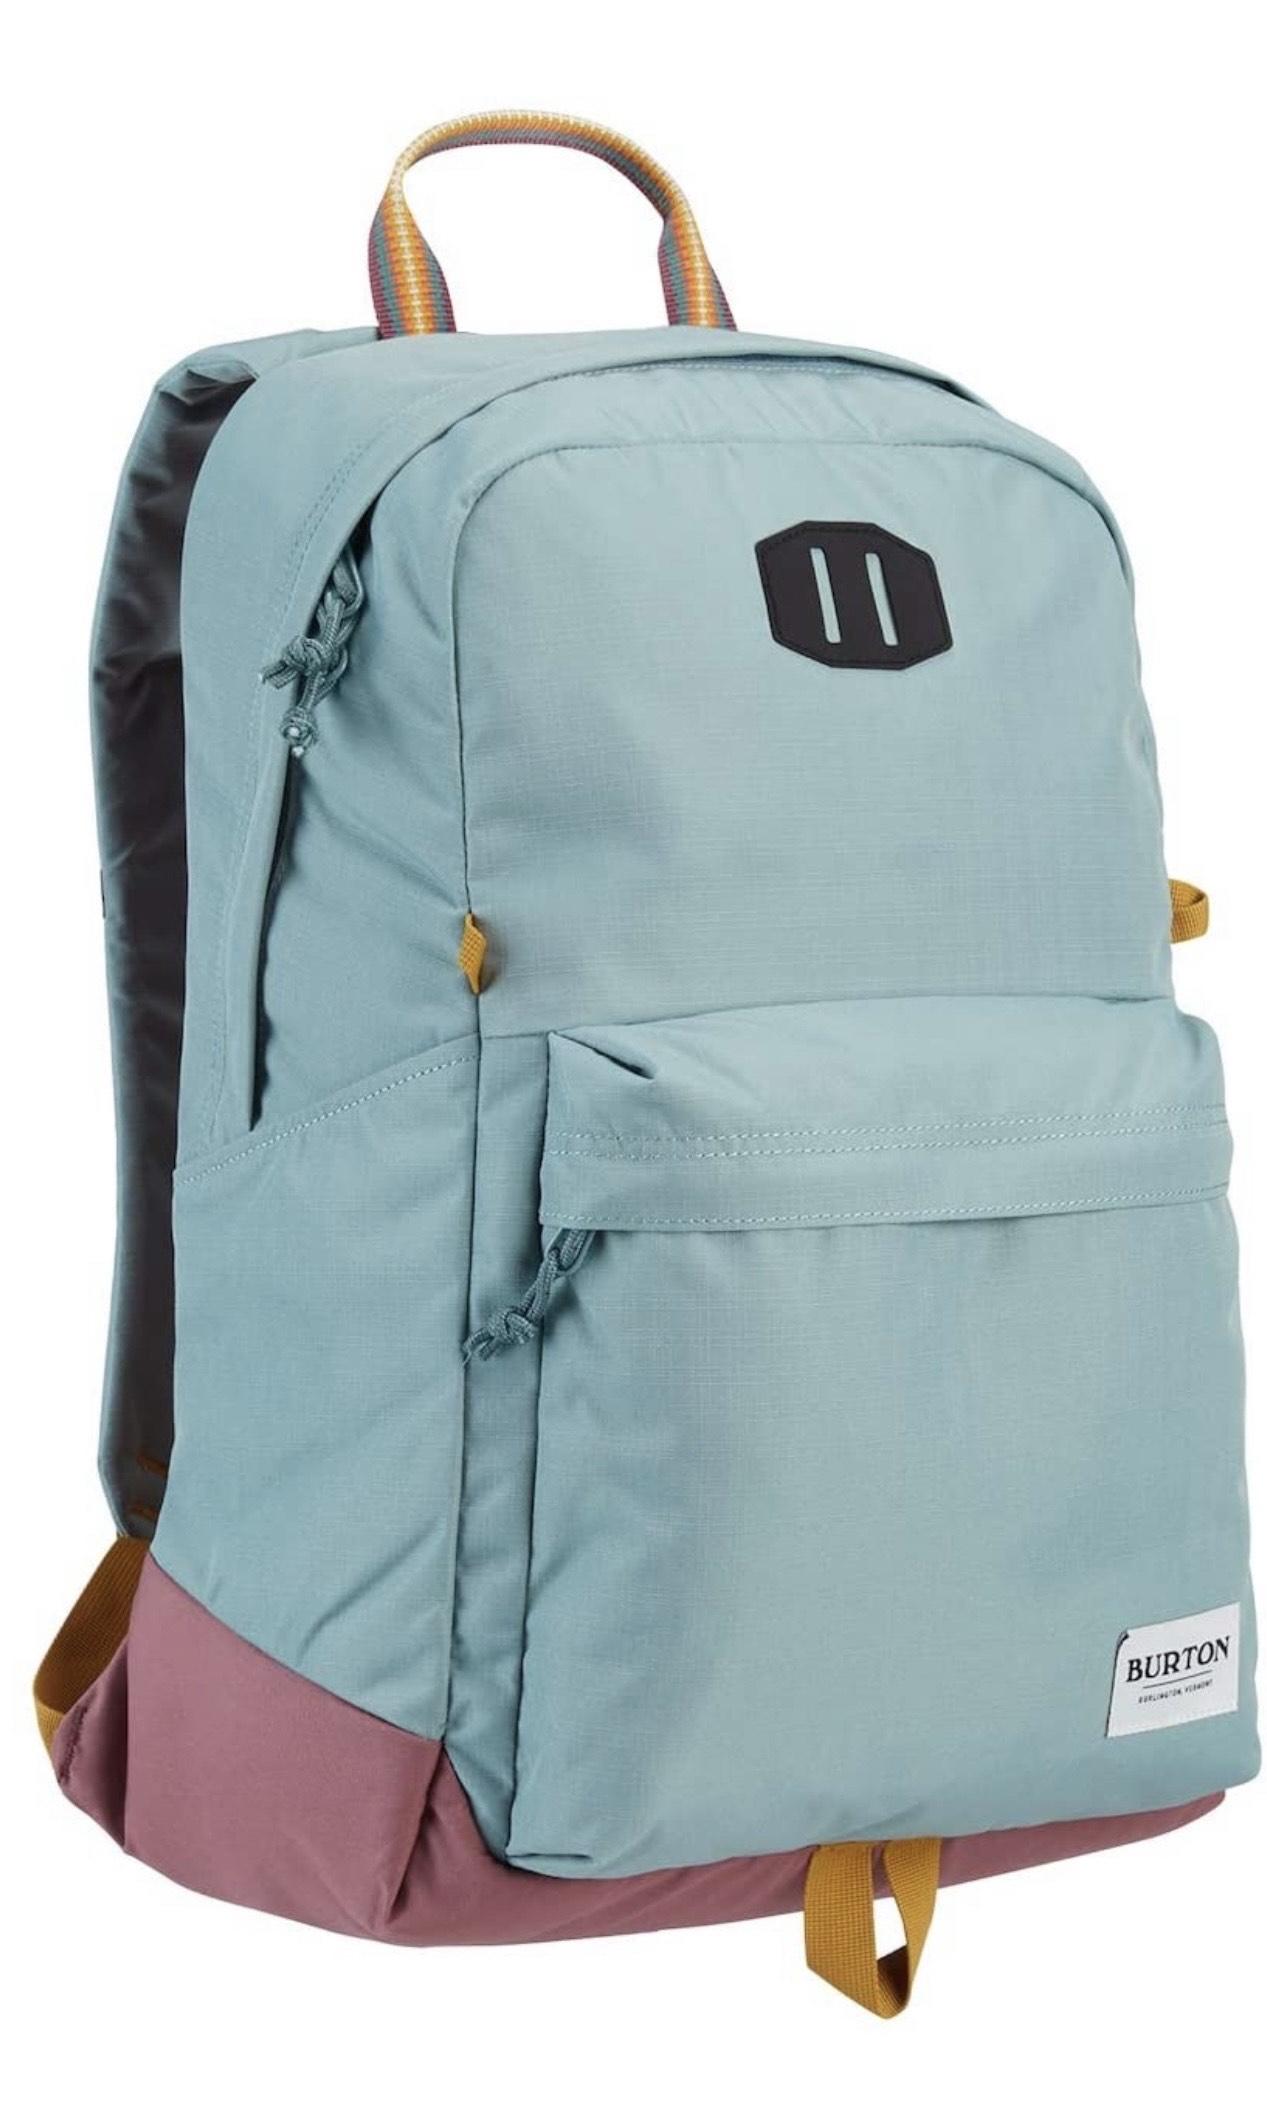 Burton Unisex – Erwachsene Kettle 2.0 Daypack, Trellis Triple Ripstop Cordura